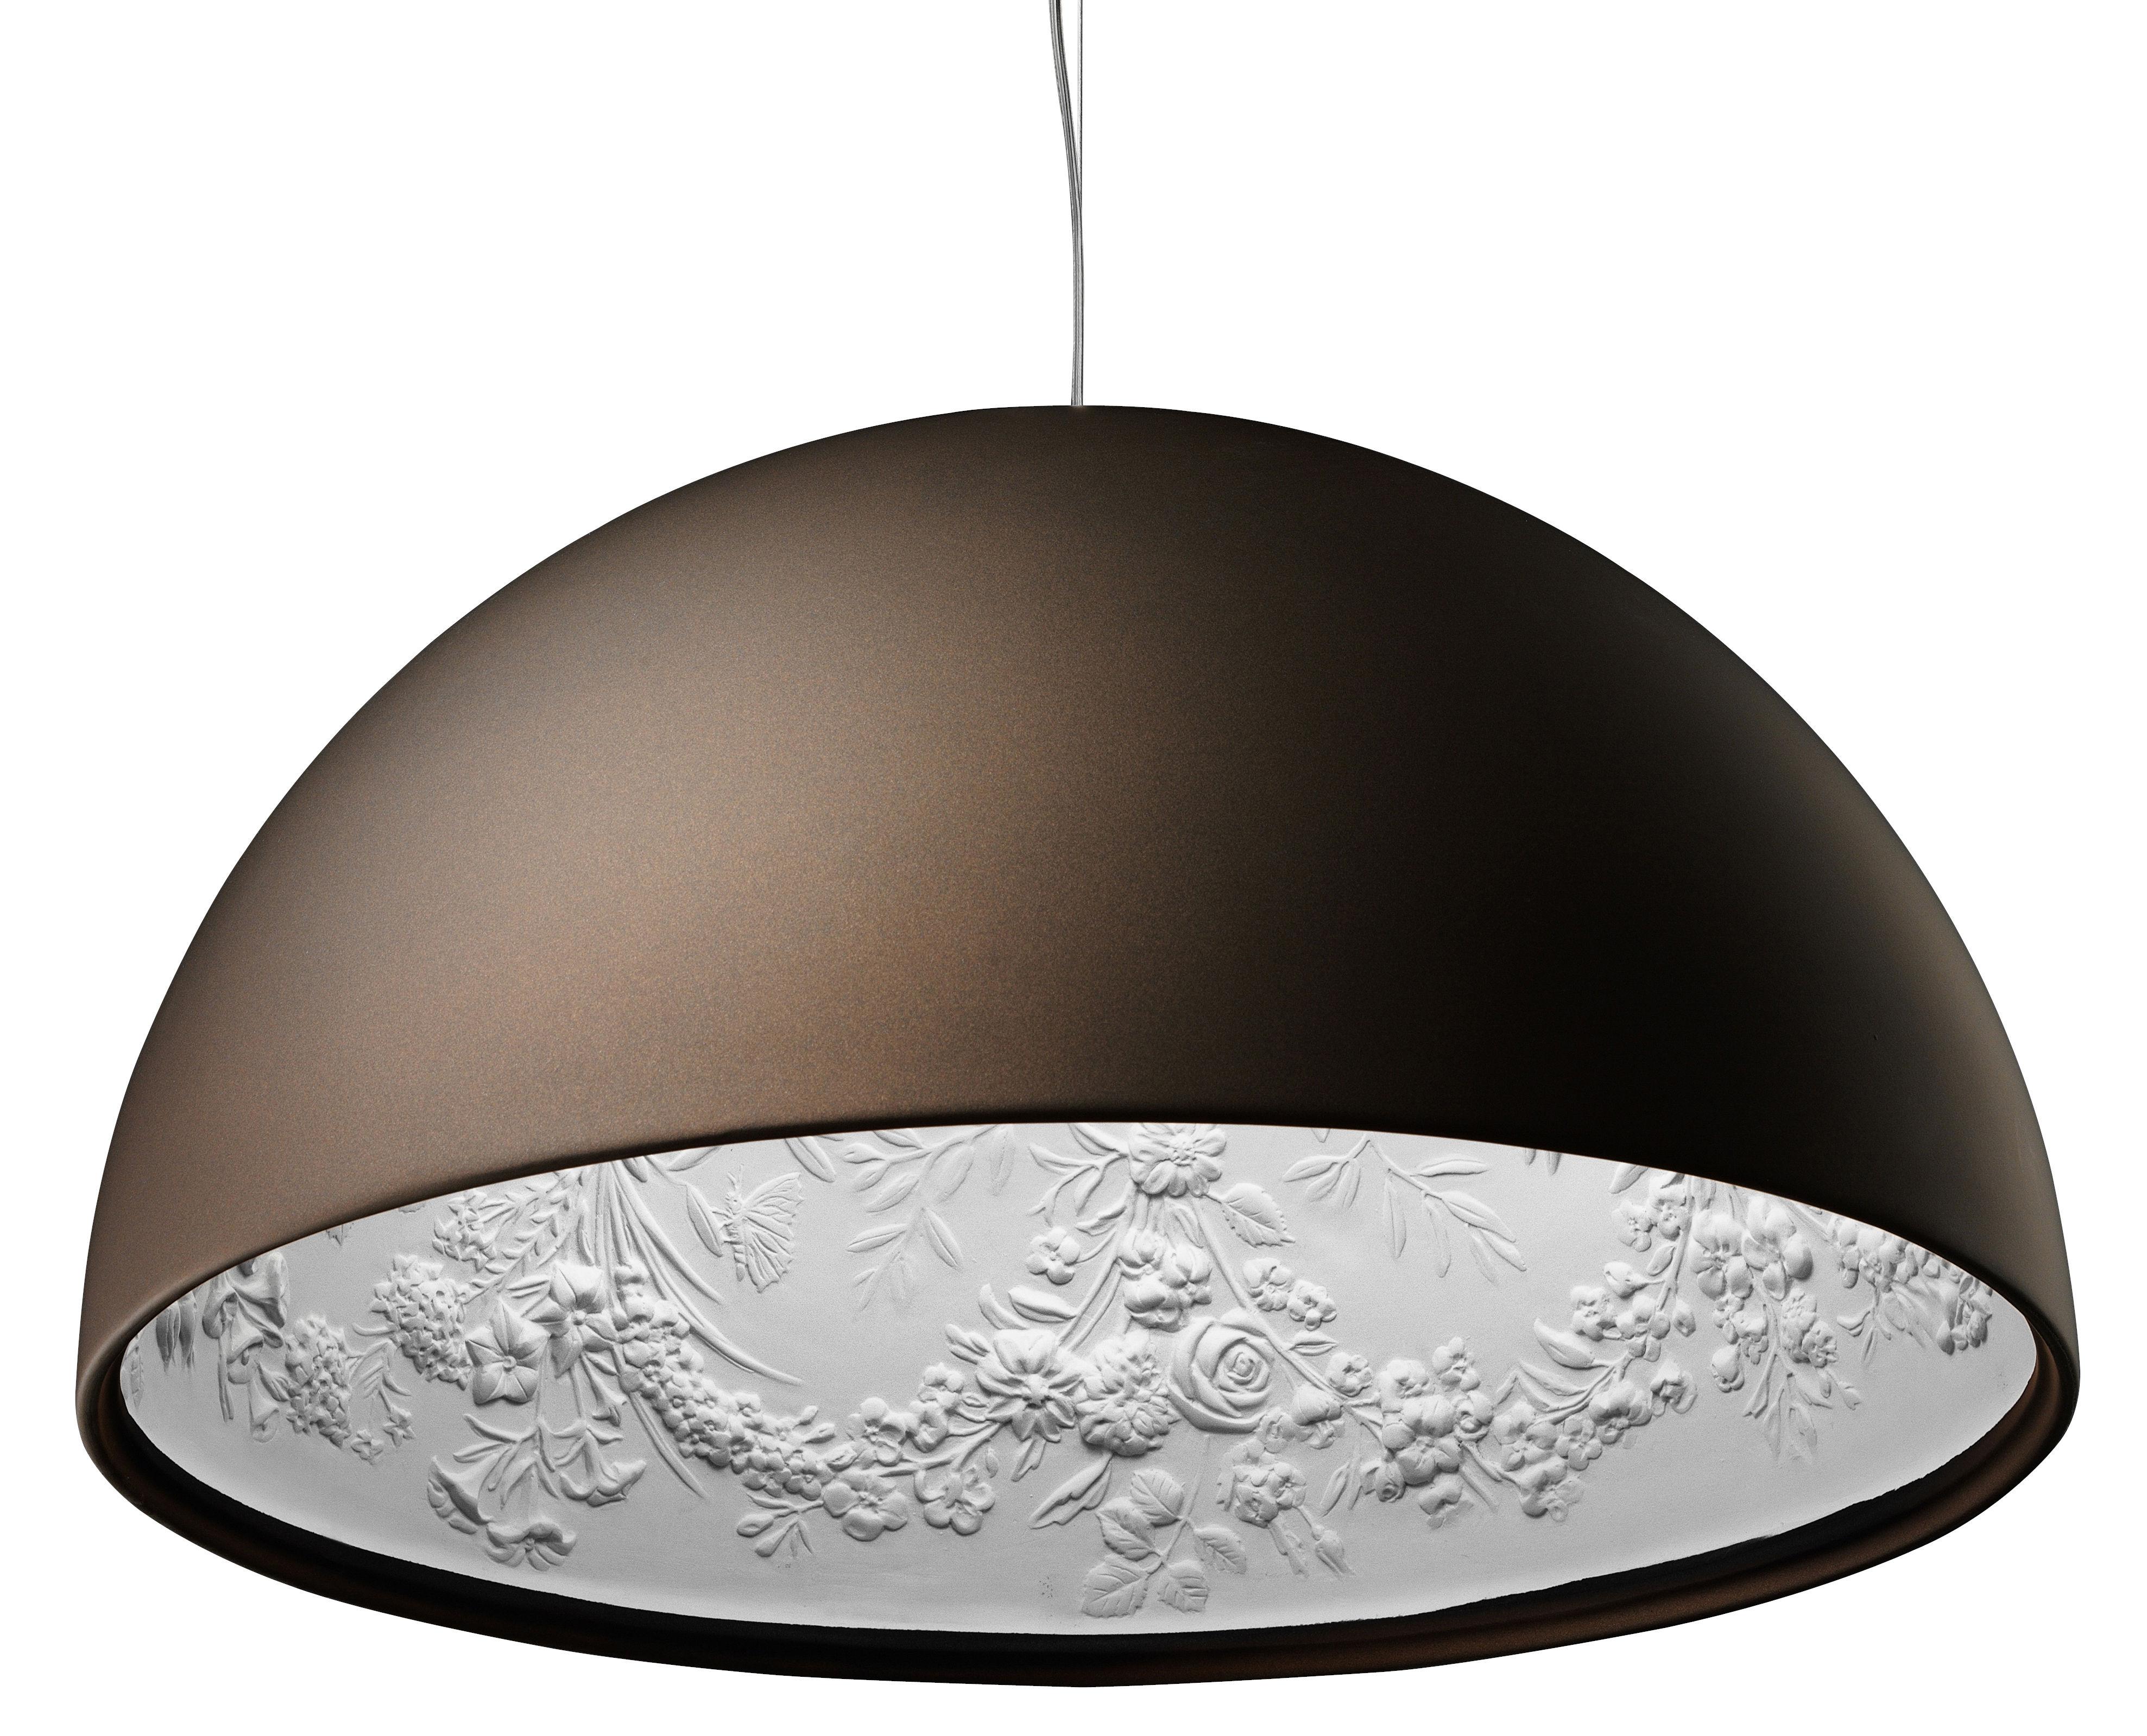 Lighting - Pendant Lighting - Skygarden 1 Pendant - Ø 60 cm by Flos - Bronze - Aluminium, Plaster